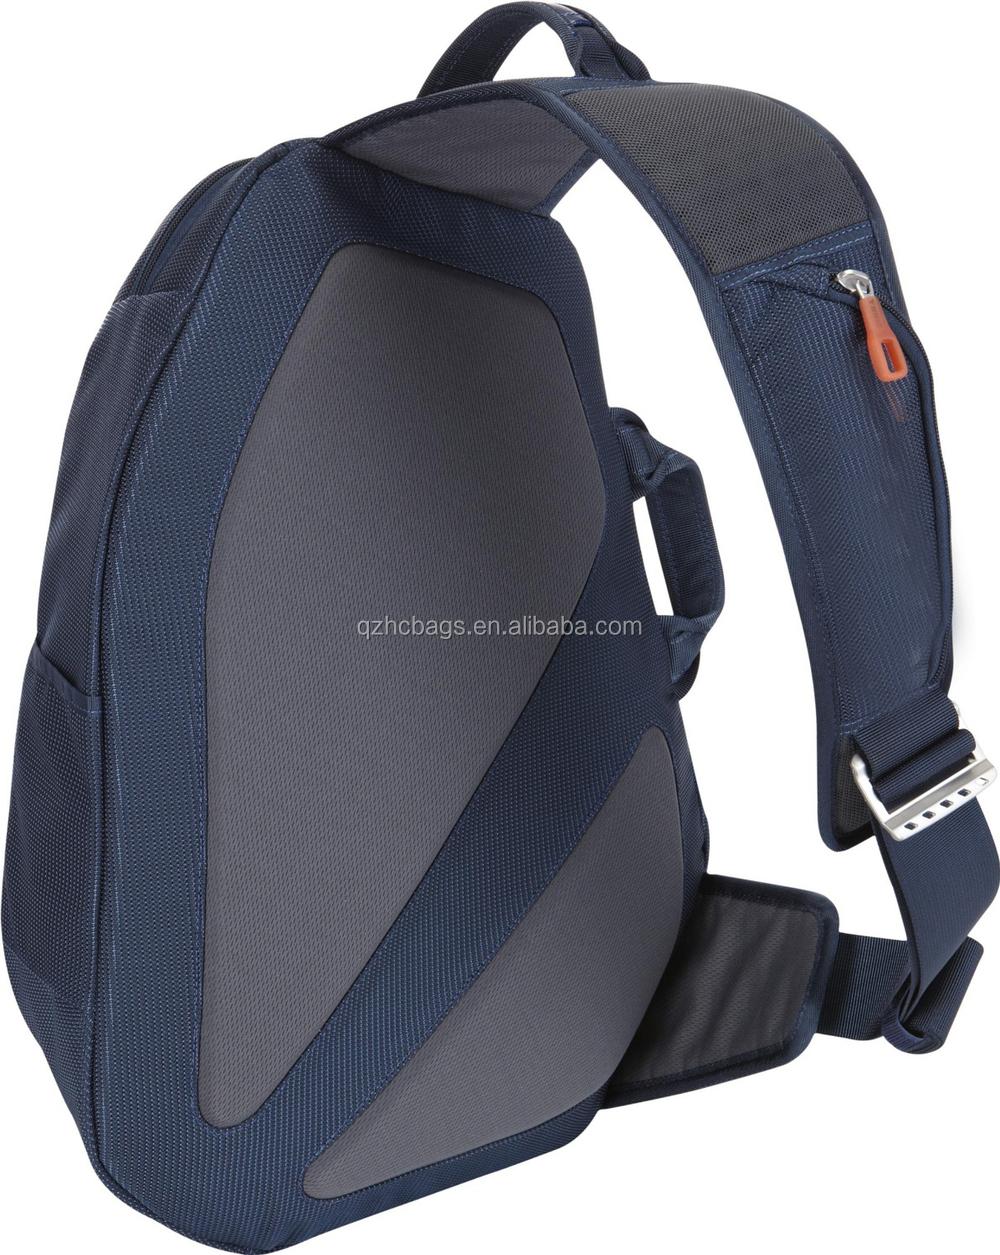 School bag new design - New Design School Bags Durable School Backpack Lightweight Book Bag Es H274